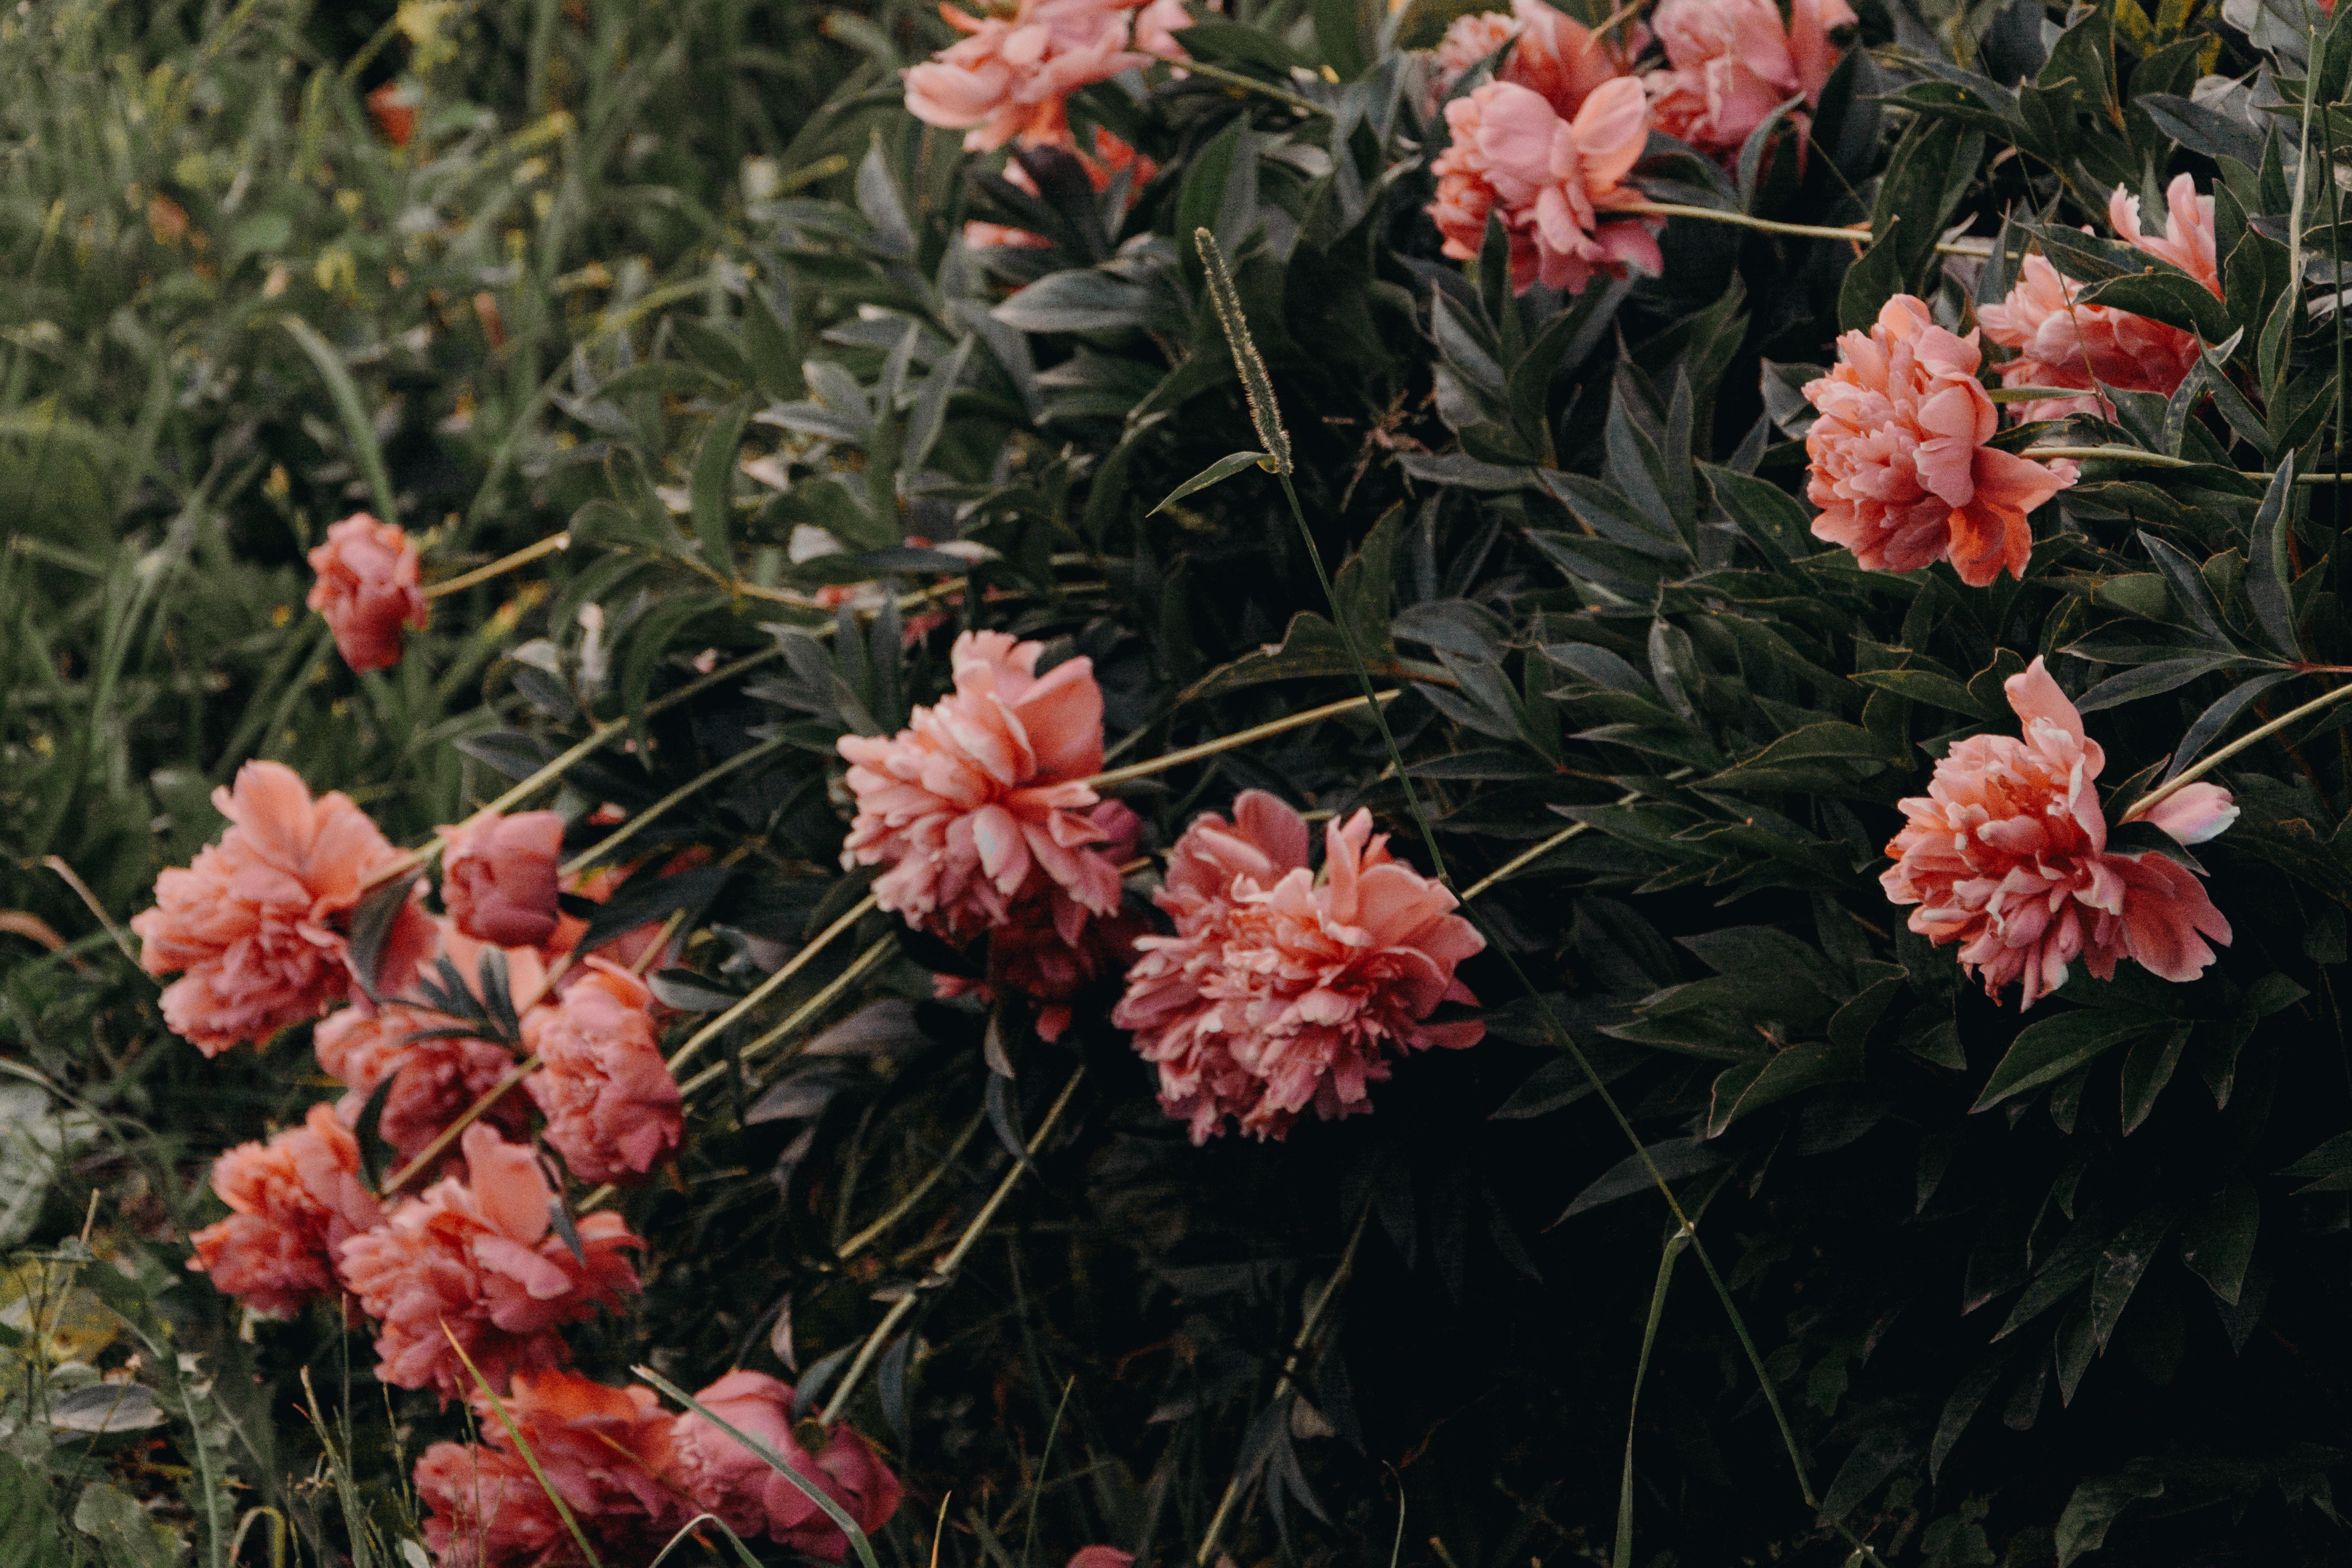 red petaled flowers on focus photo